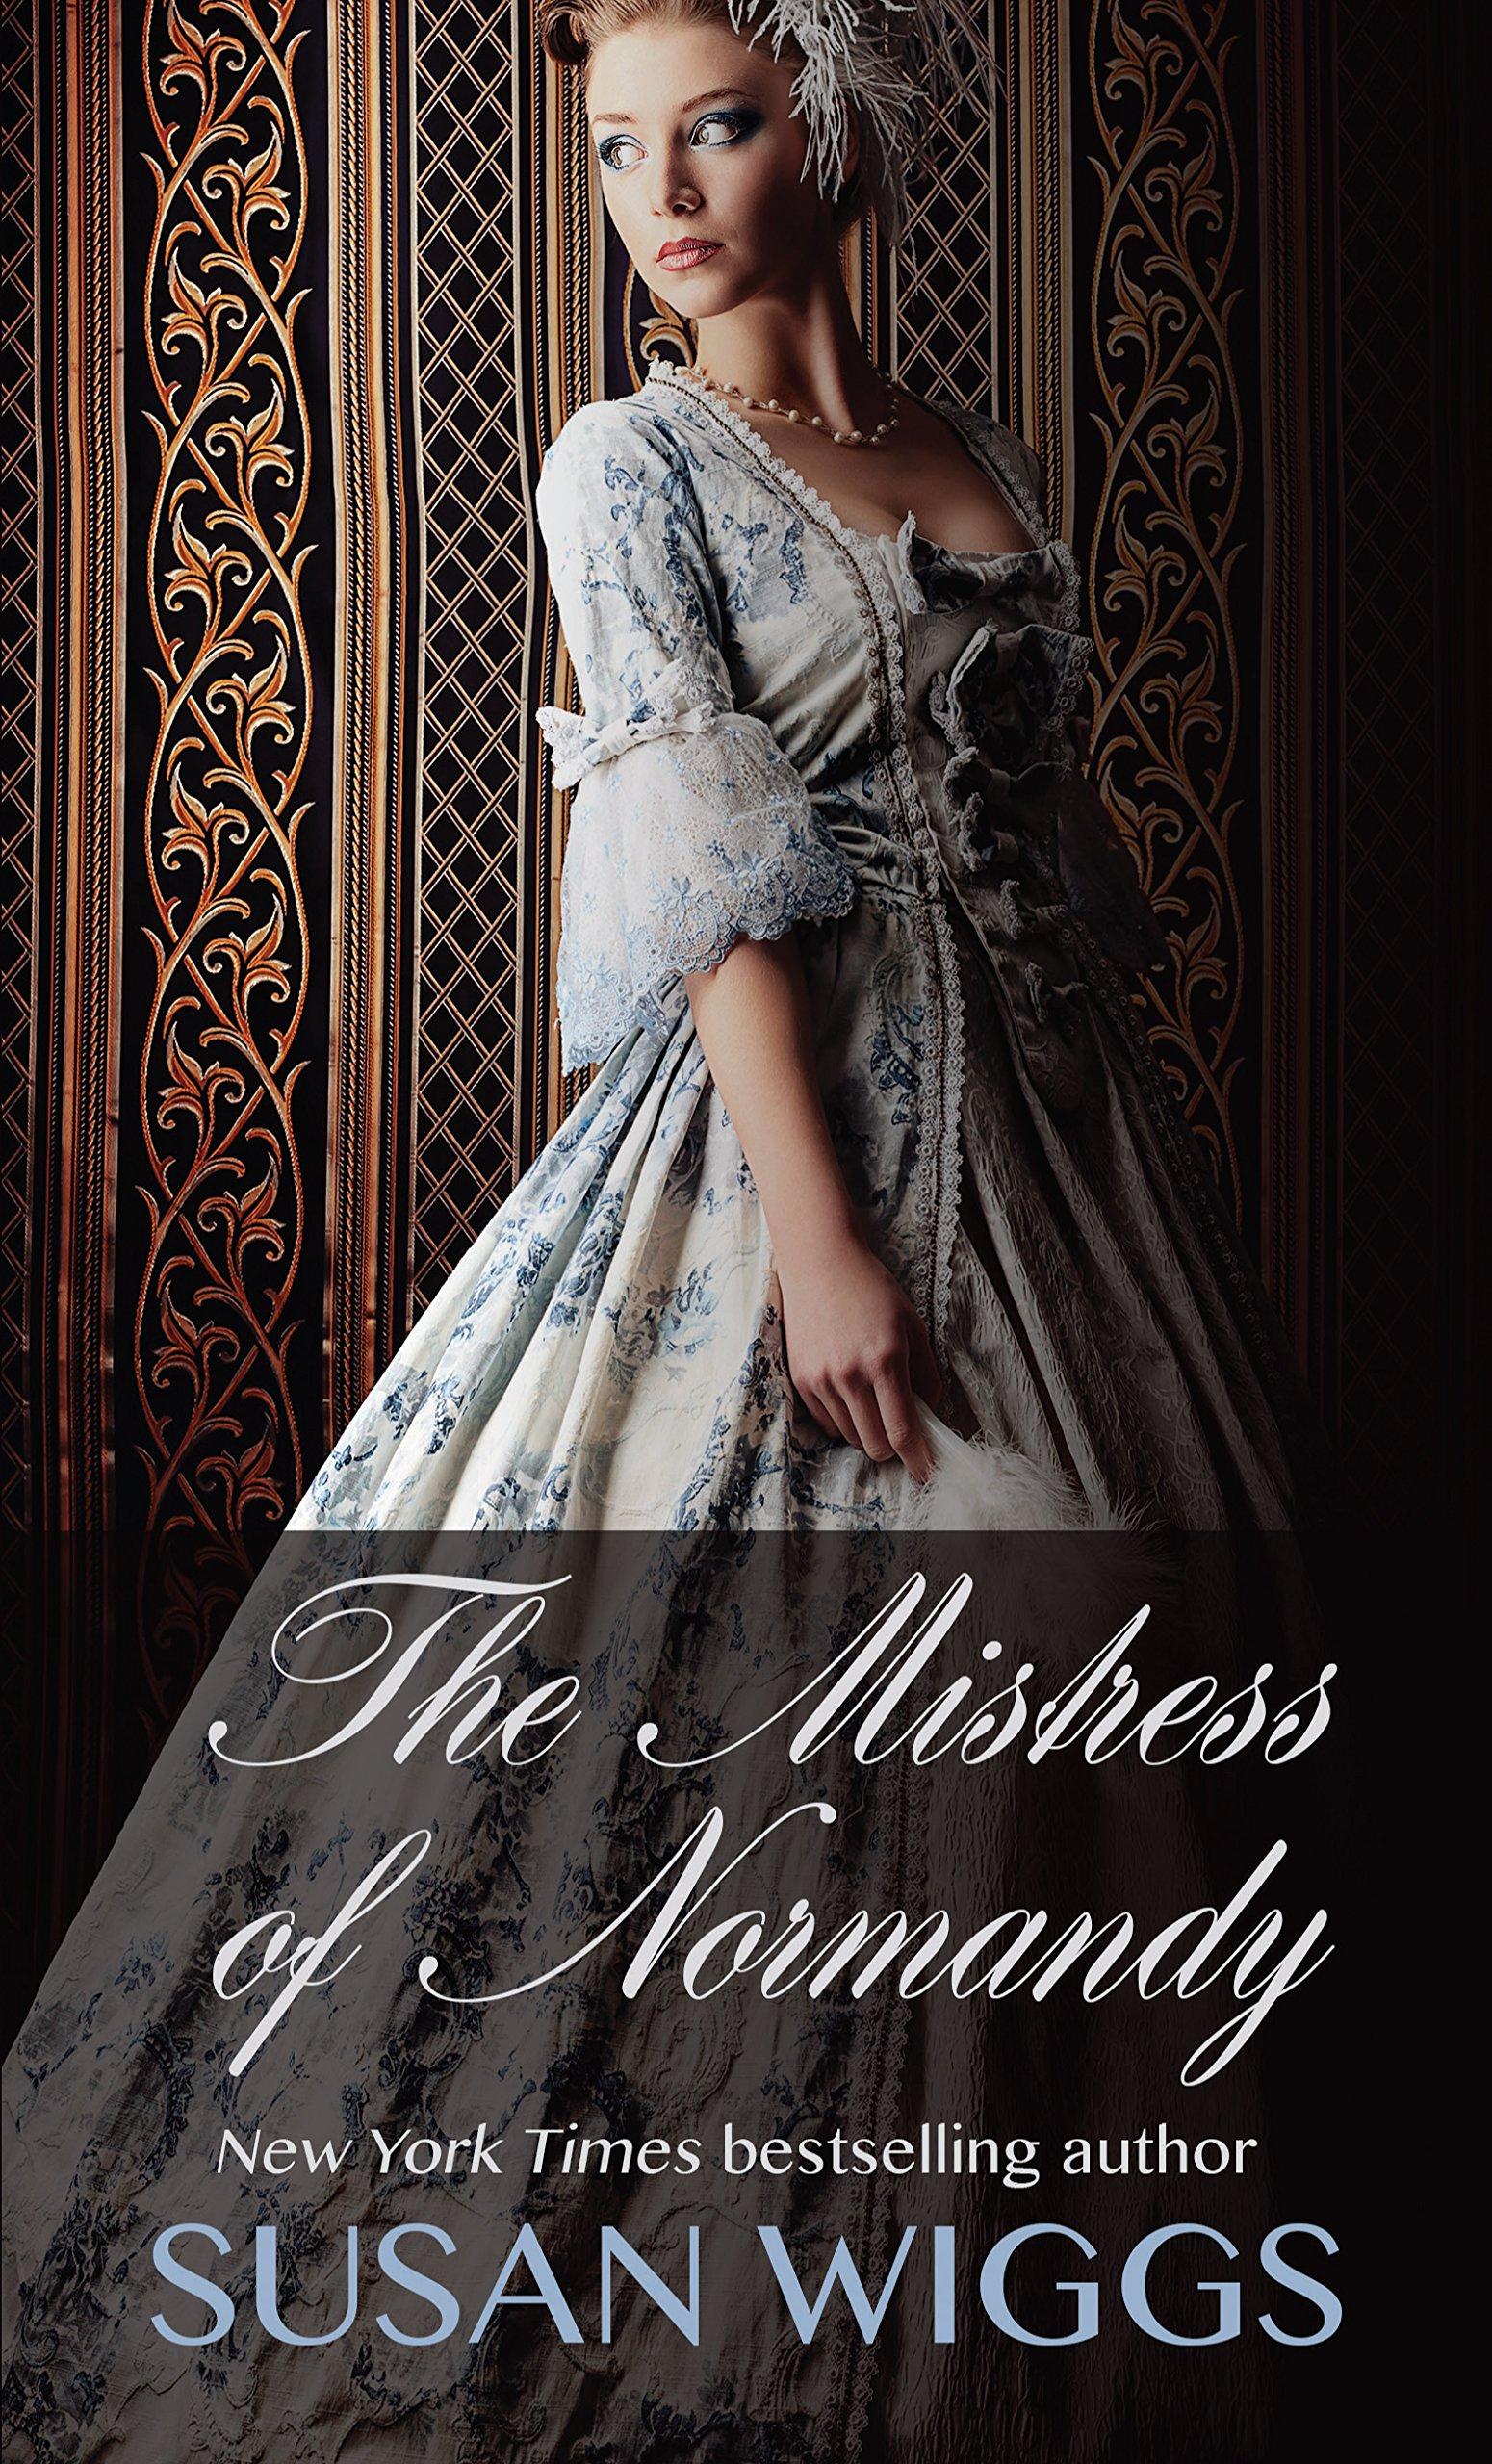 Download The Mistress Of Normandy (Thorndike Press Large Print Romance) pdf